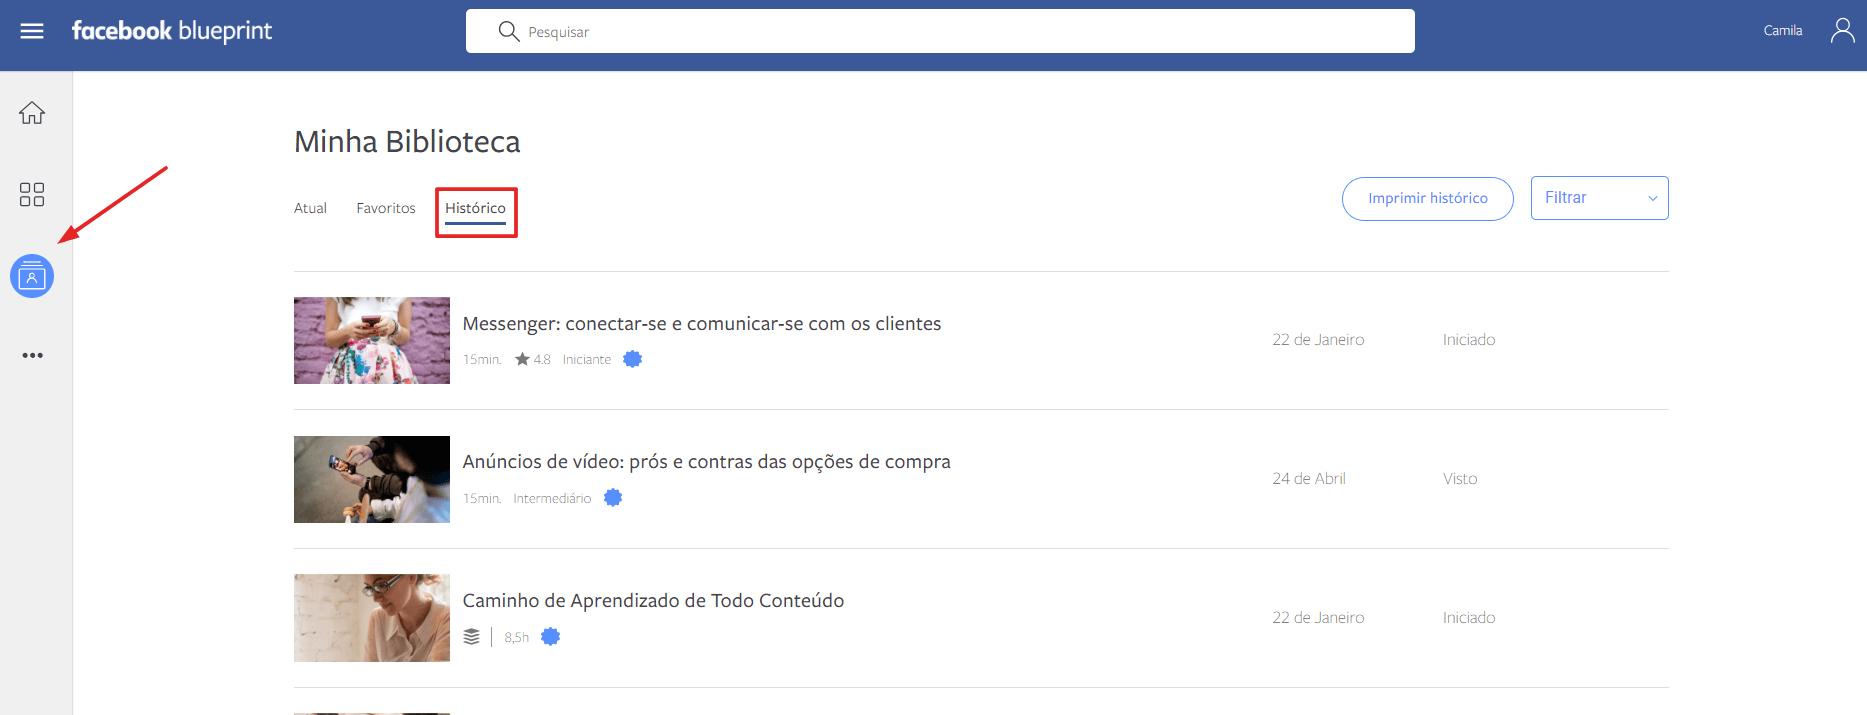 biblioteca facebook blueprint